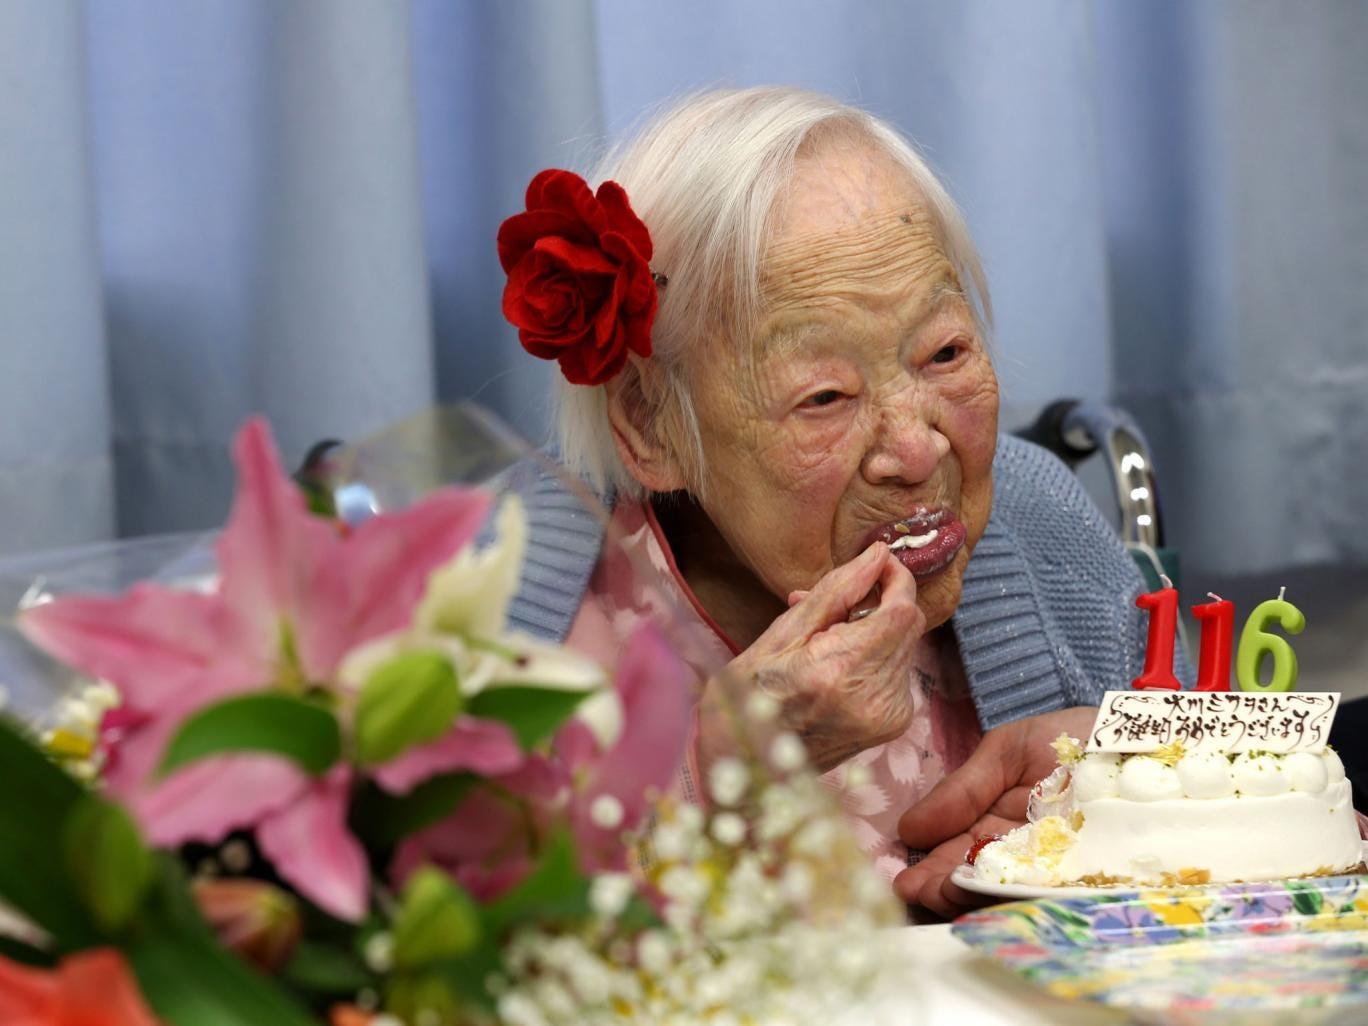 Misao Okawa, the world's oldest Japanese woman eats her birthday cake